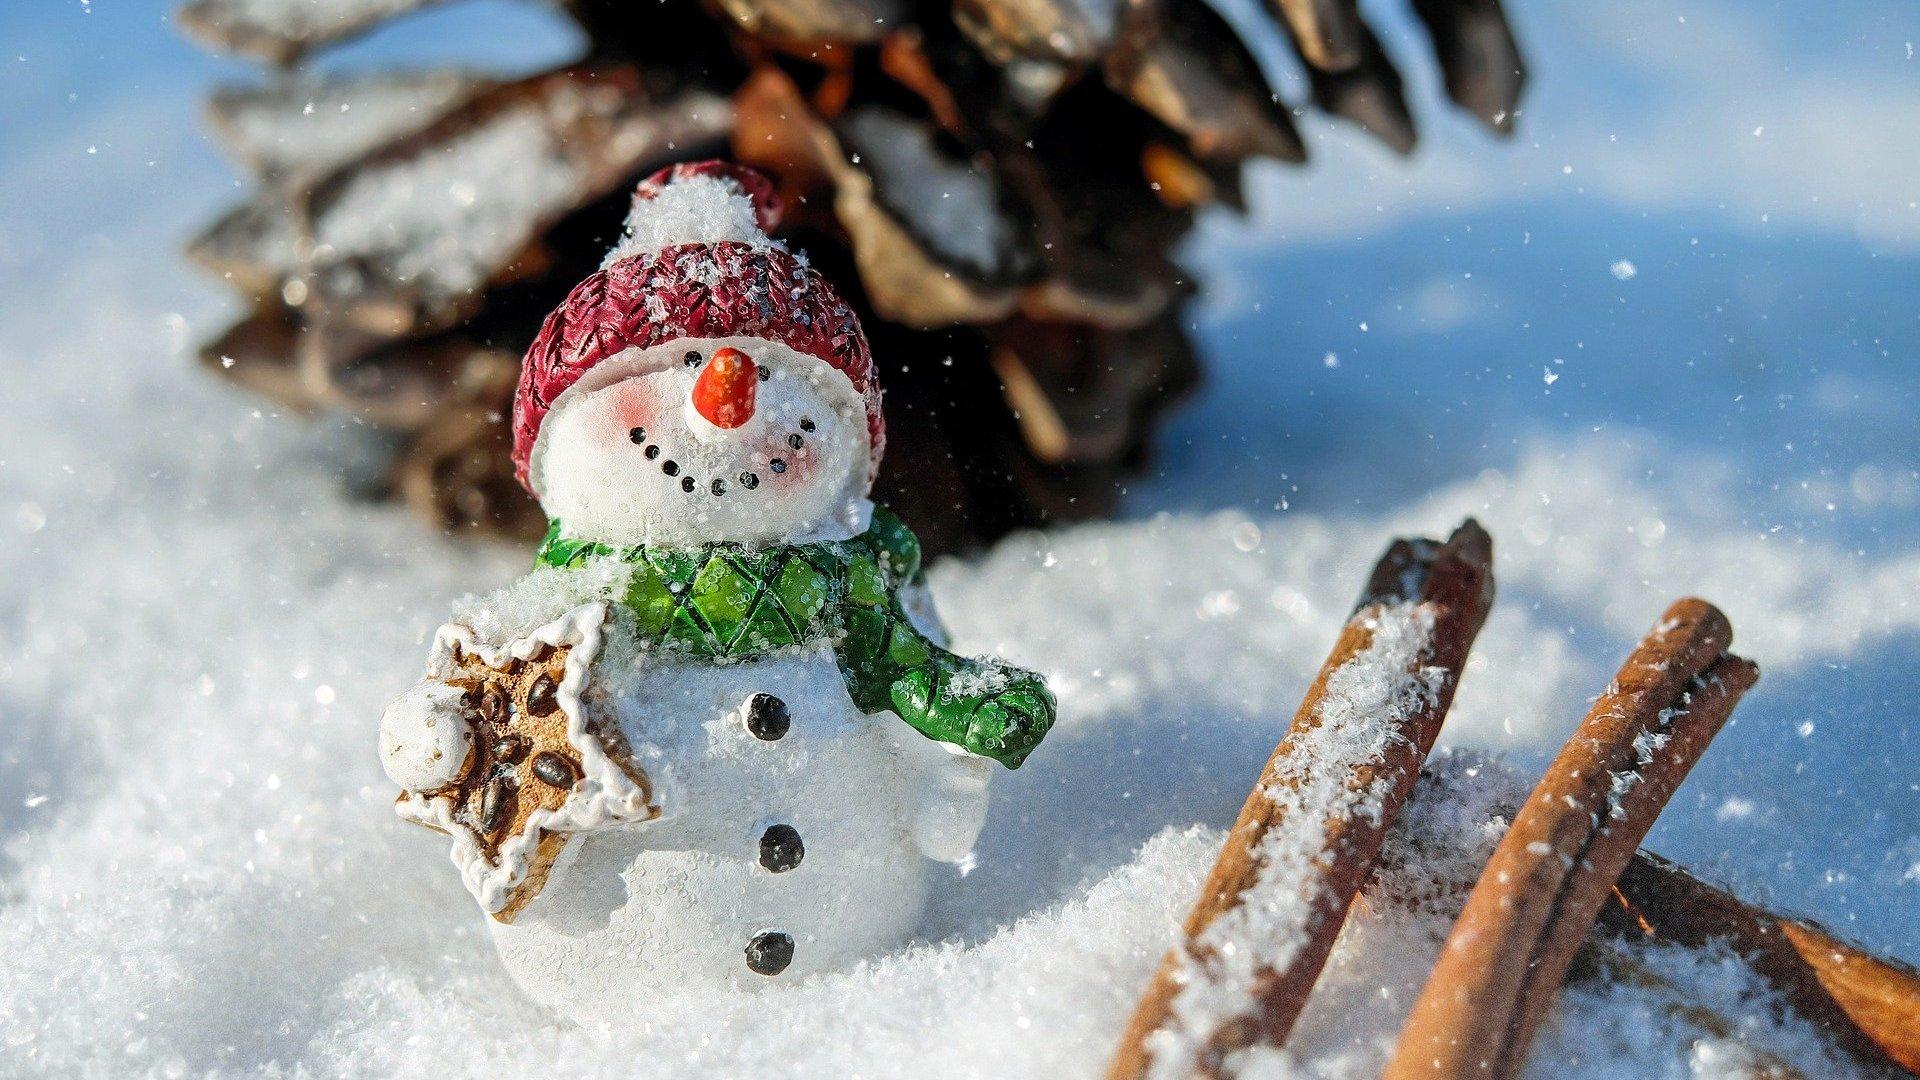 18. December - Stressjulekalenderen